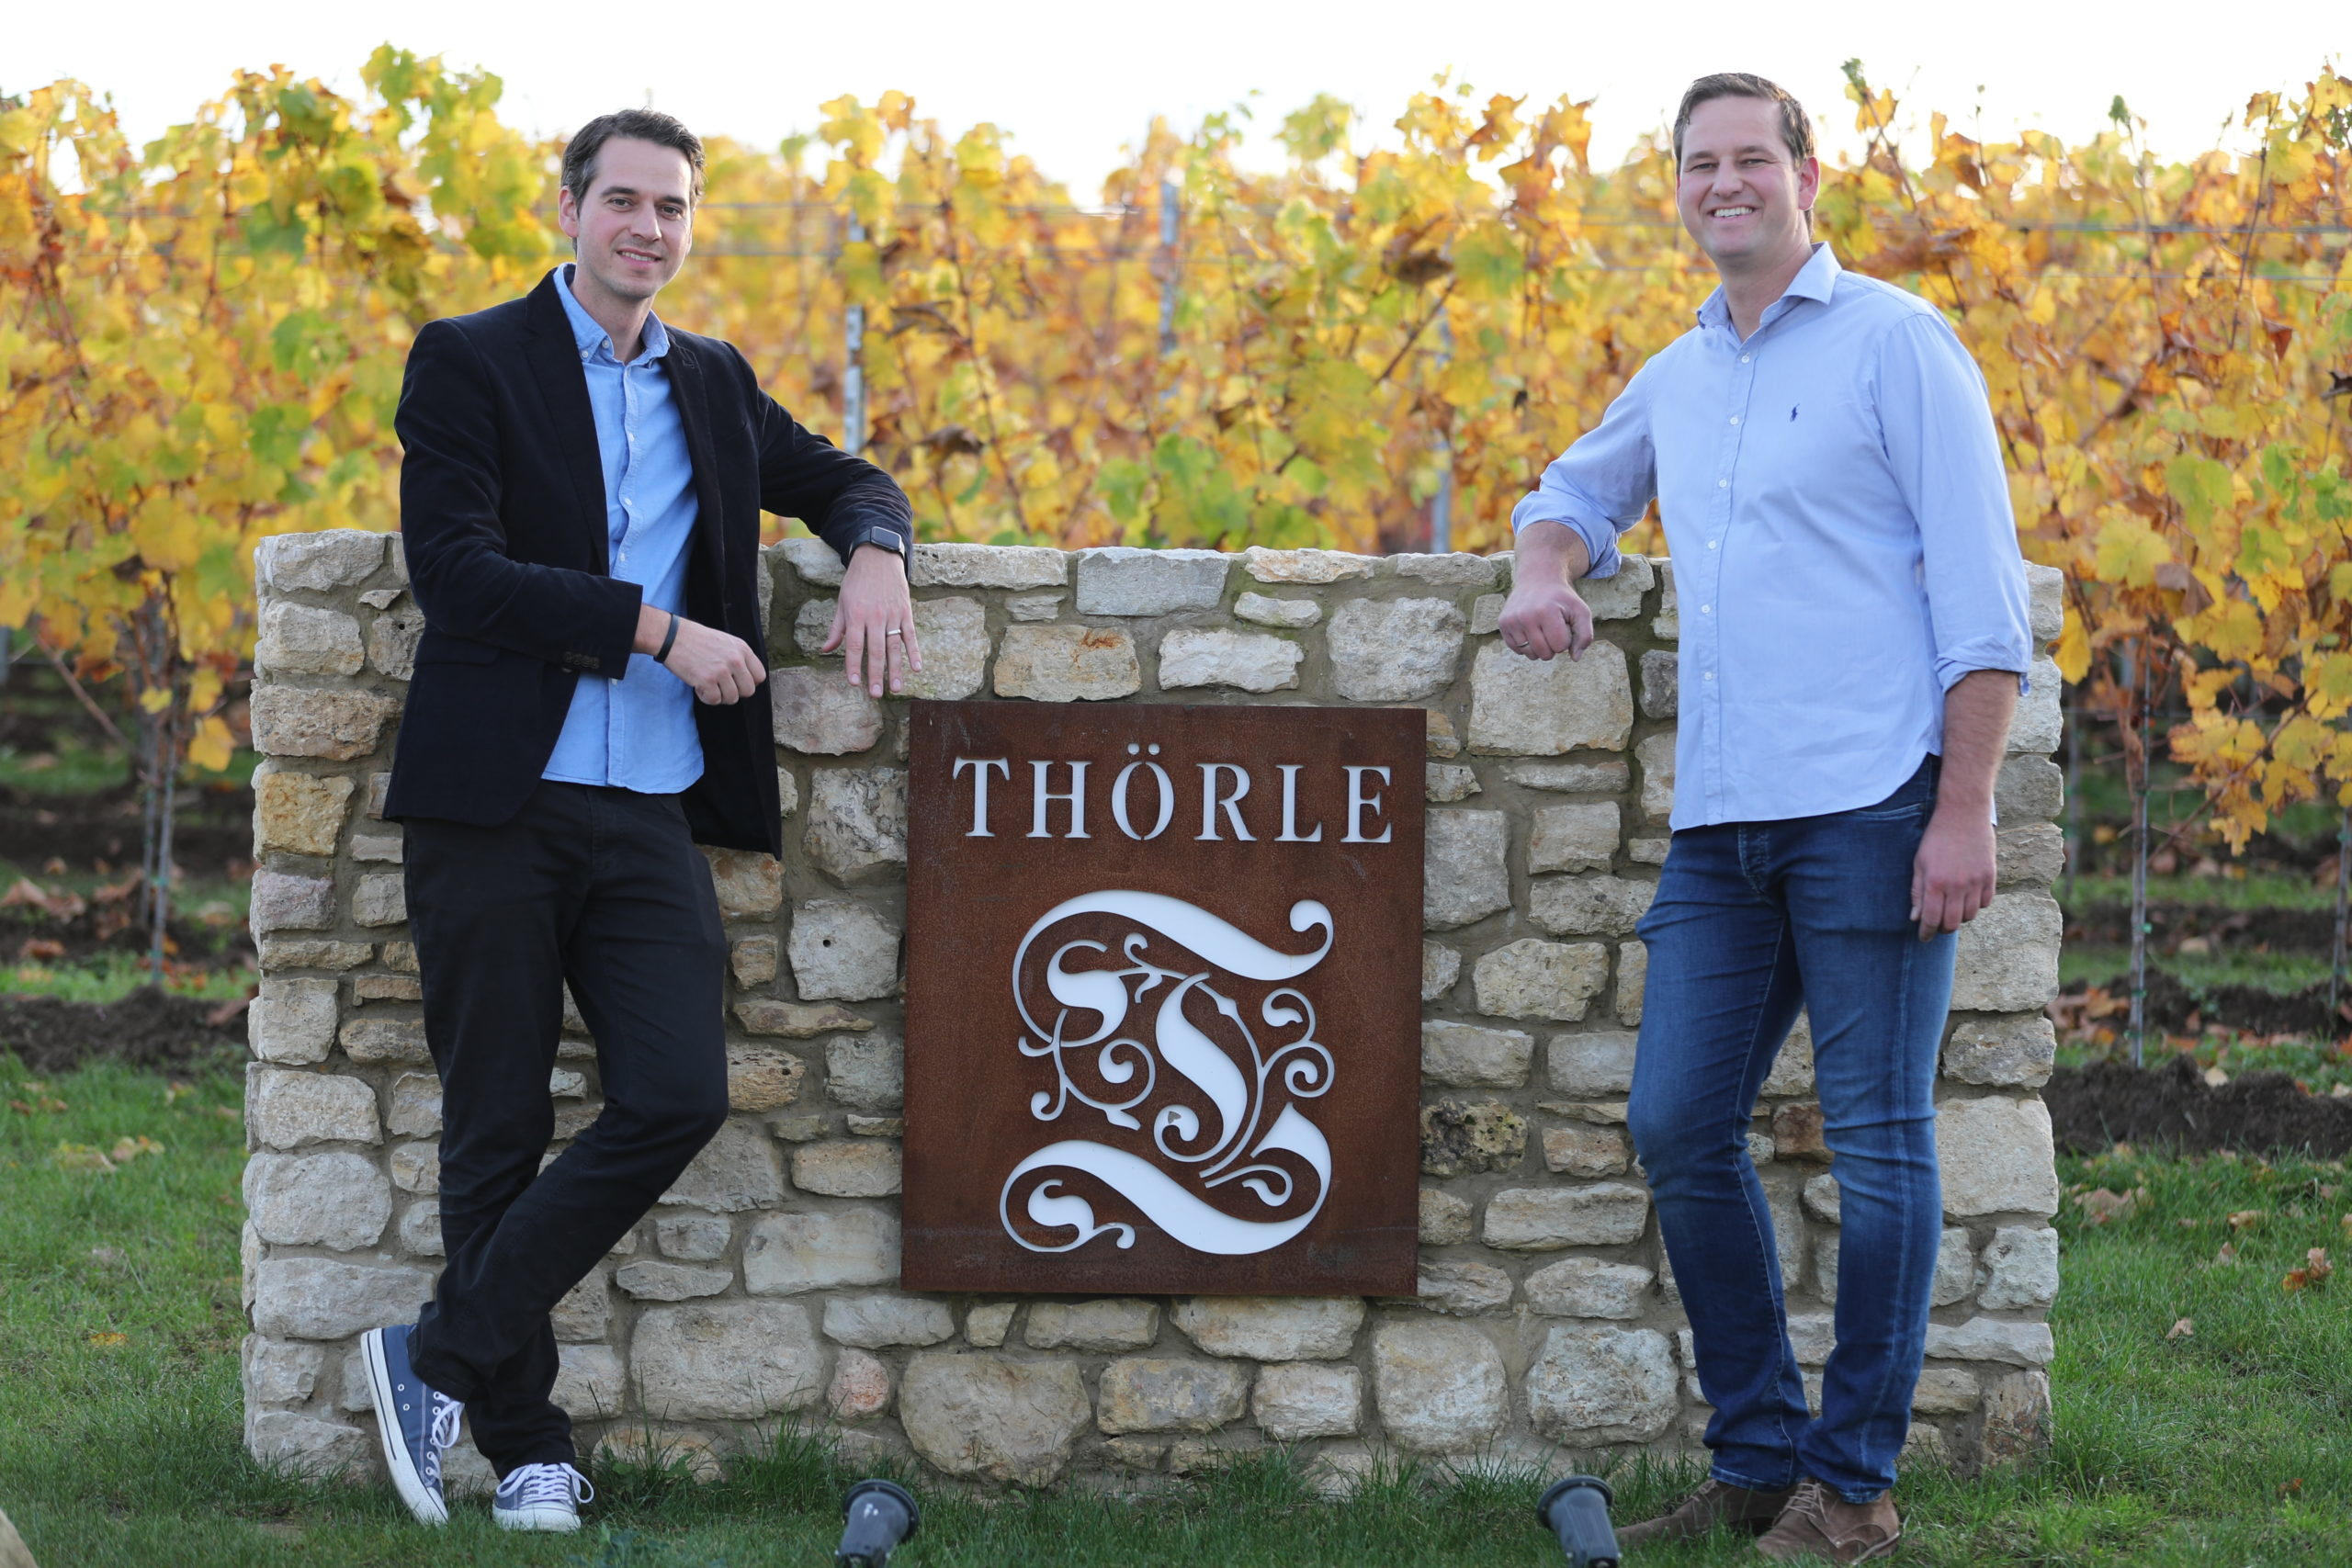 Thorle Winery